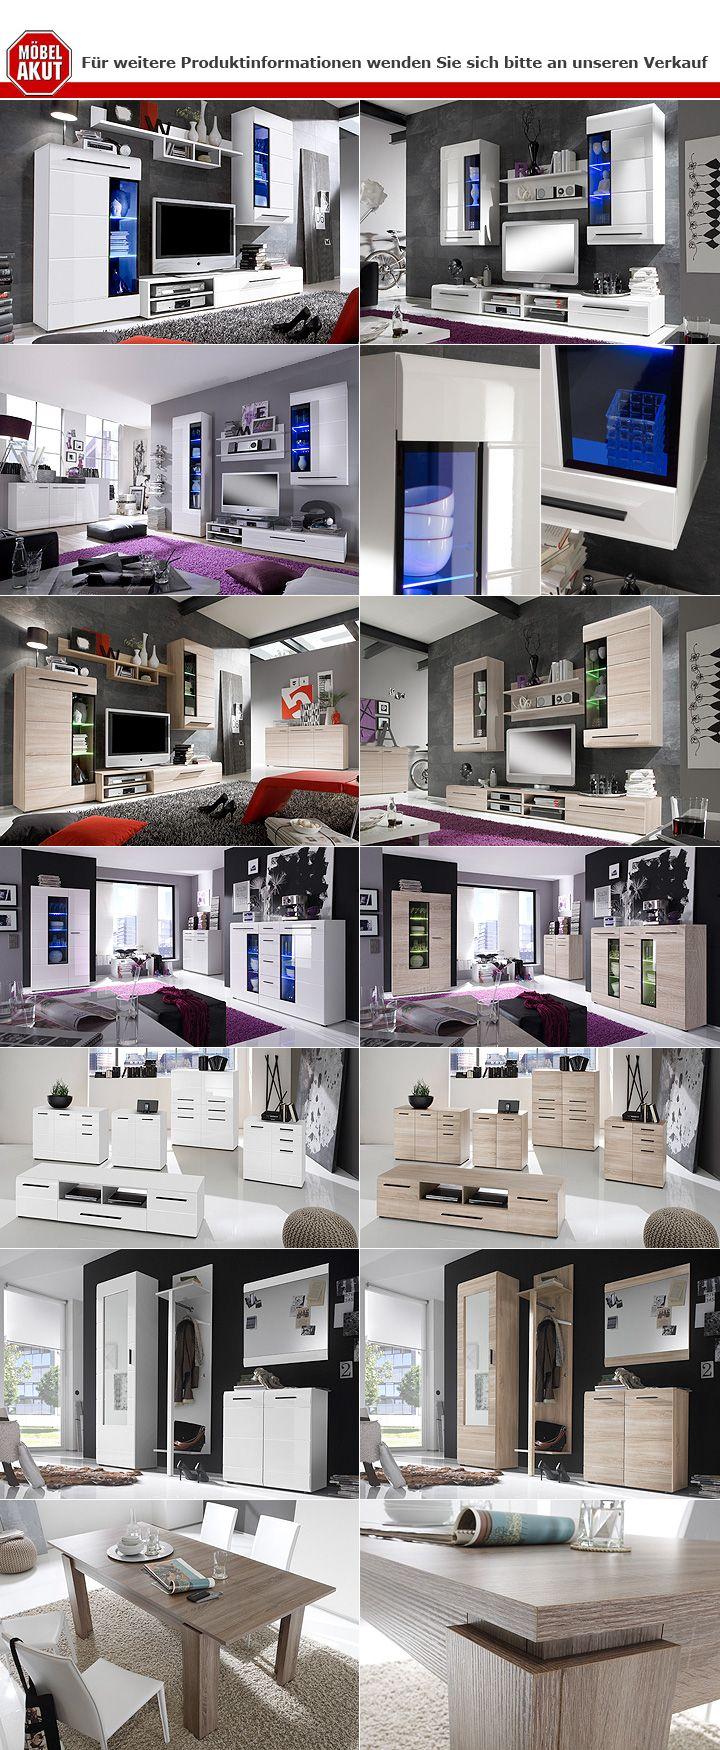 kommode iii anoma sideboard sonoma eiche s gerau dunkel braun hochglanz ebay. Black Bedroom Furniture Sets. Home Design Ideas